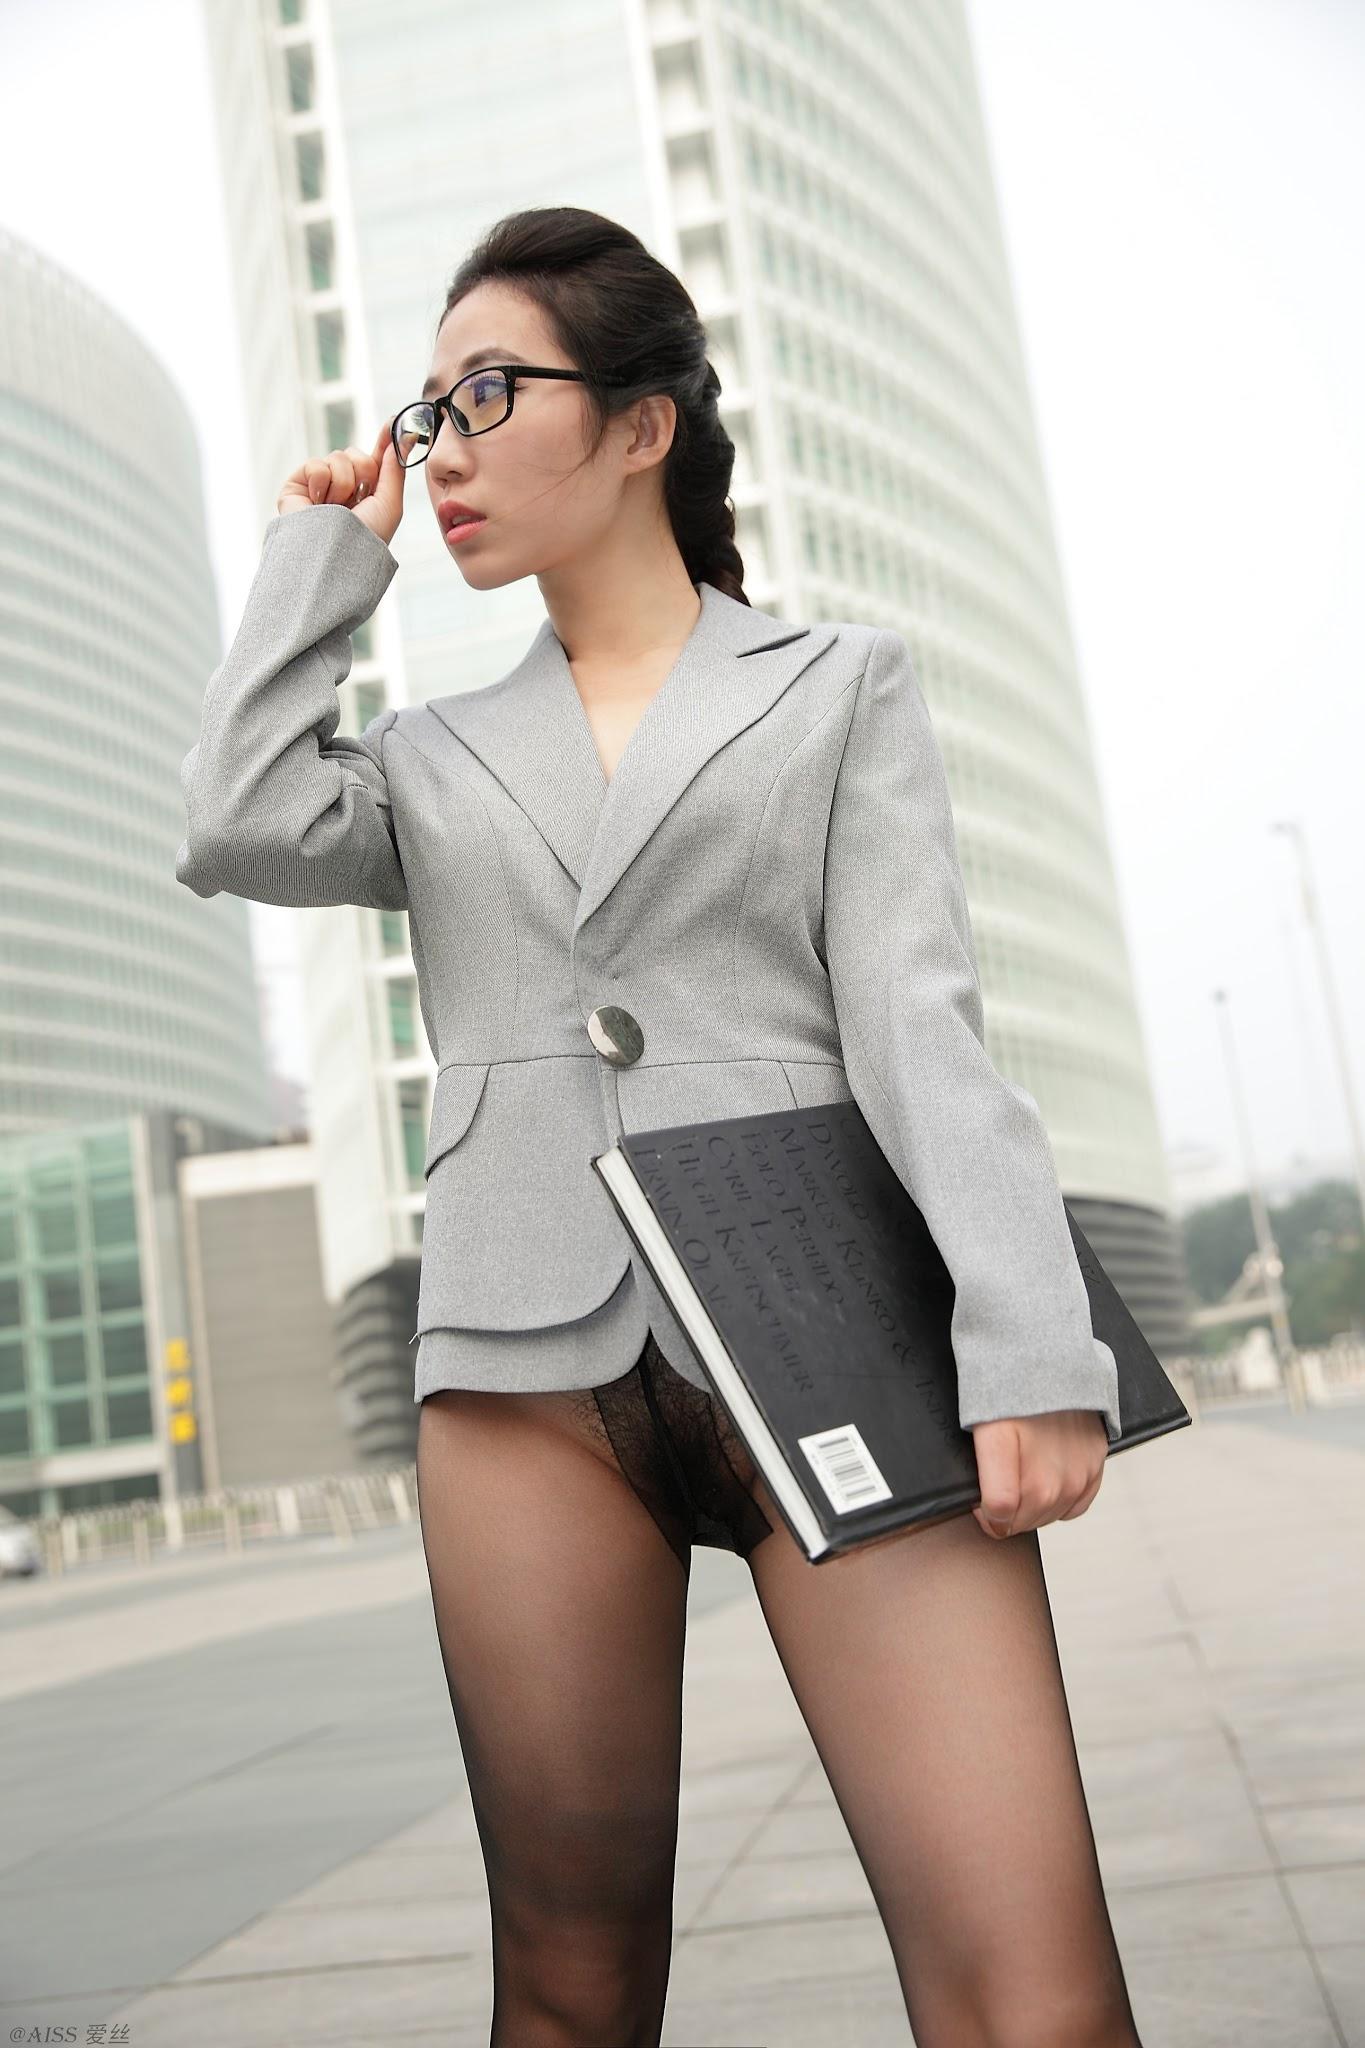 Meisi Office Girl Pussy Seethrough 美丝职员 AISS爱丝 NO.004